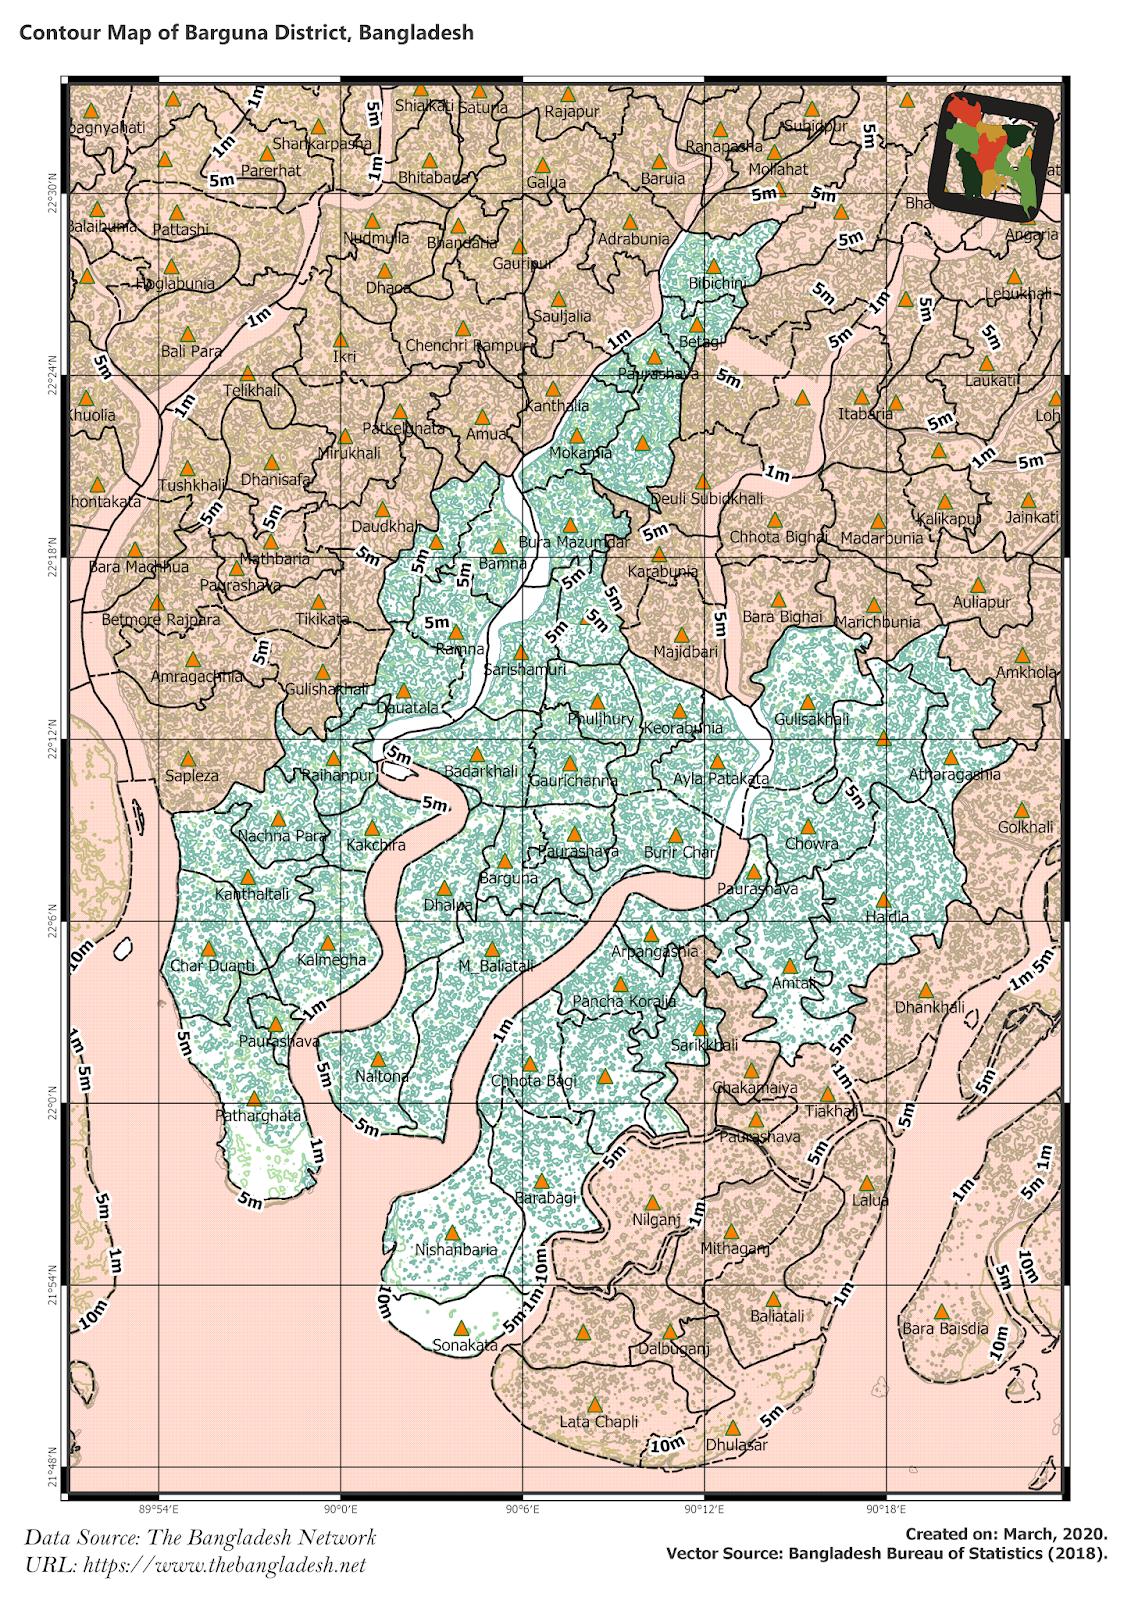 Elevation Map of Barguna District of Bangladesh